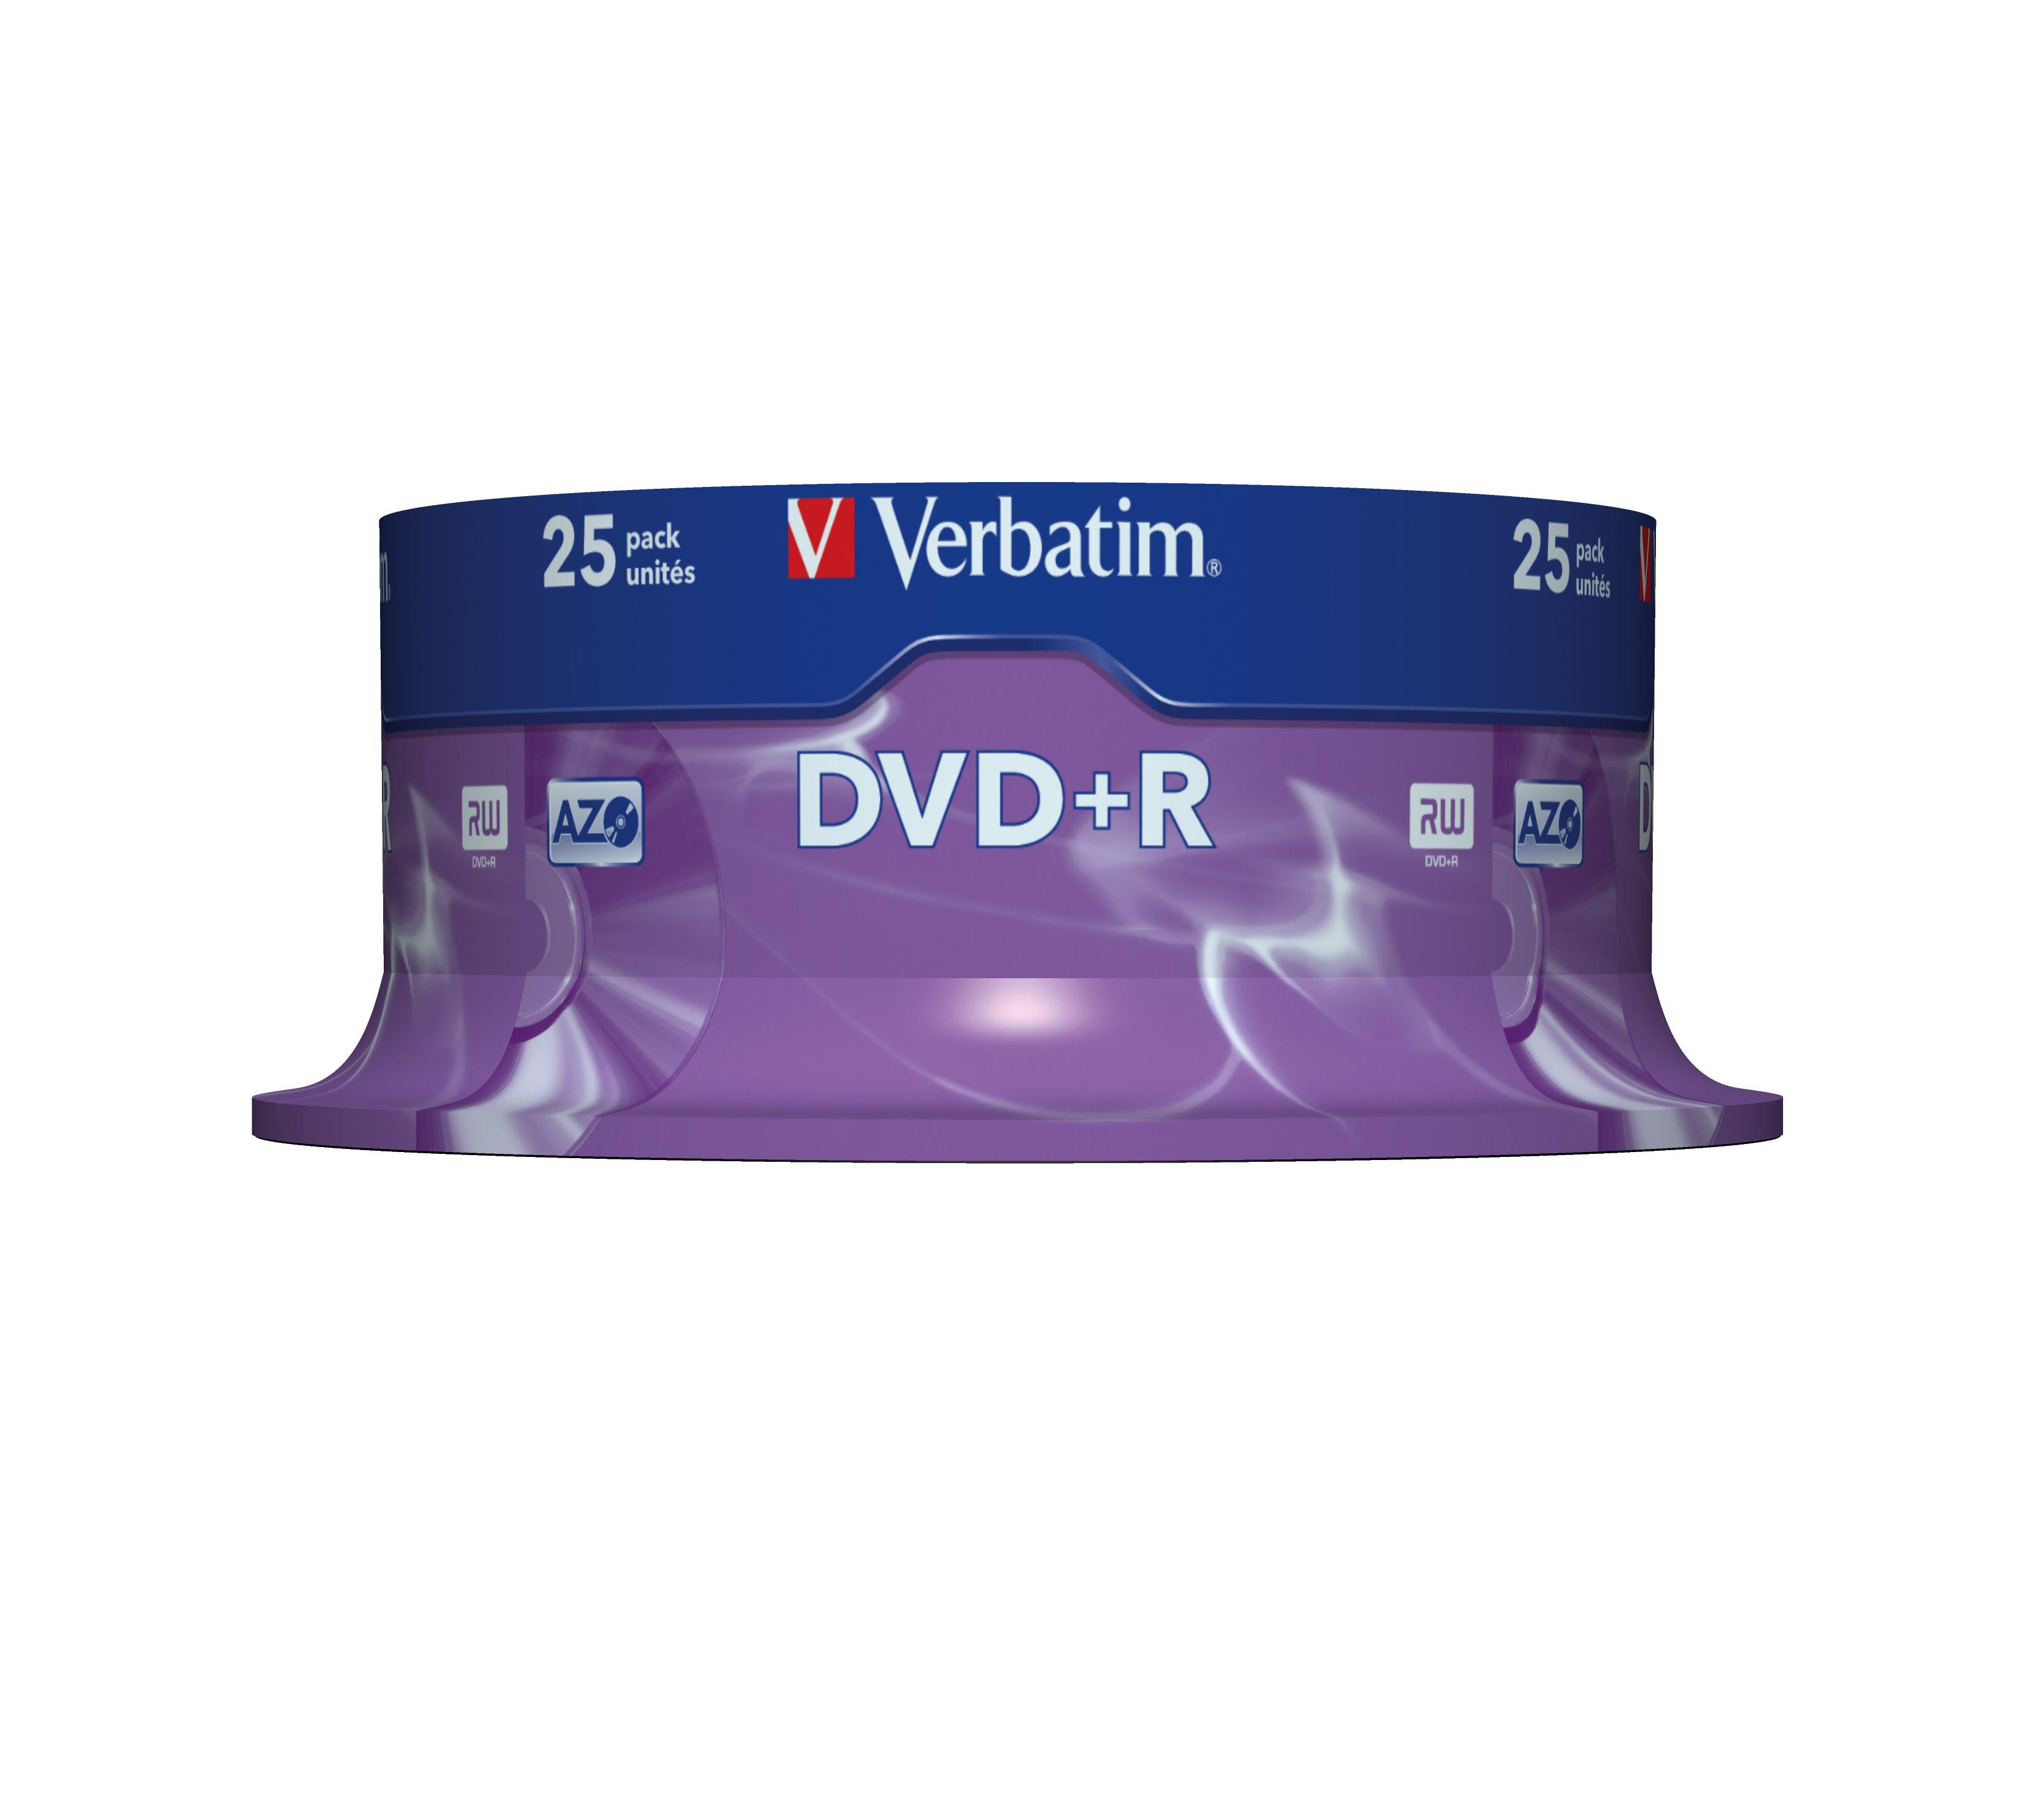 DVD+R 4,7 GB 16 speed (Advanced AZO, 25-spindel)